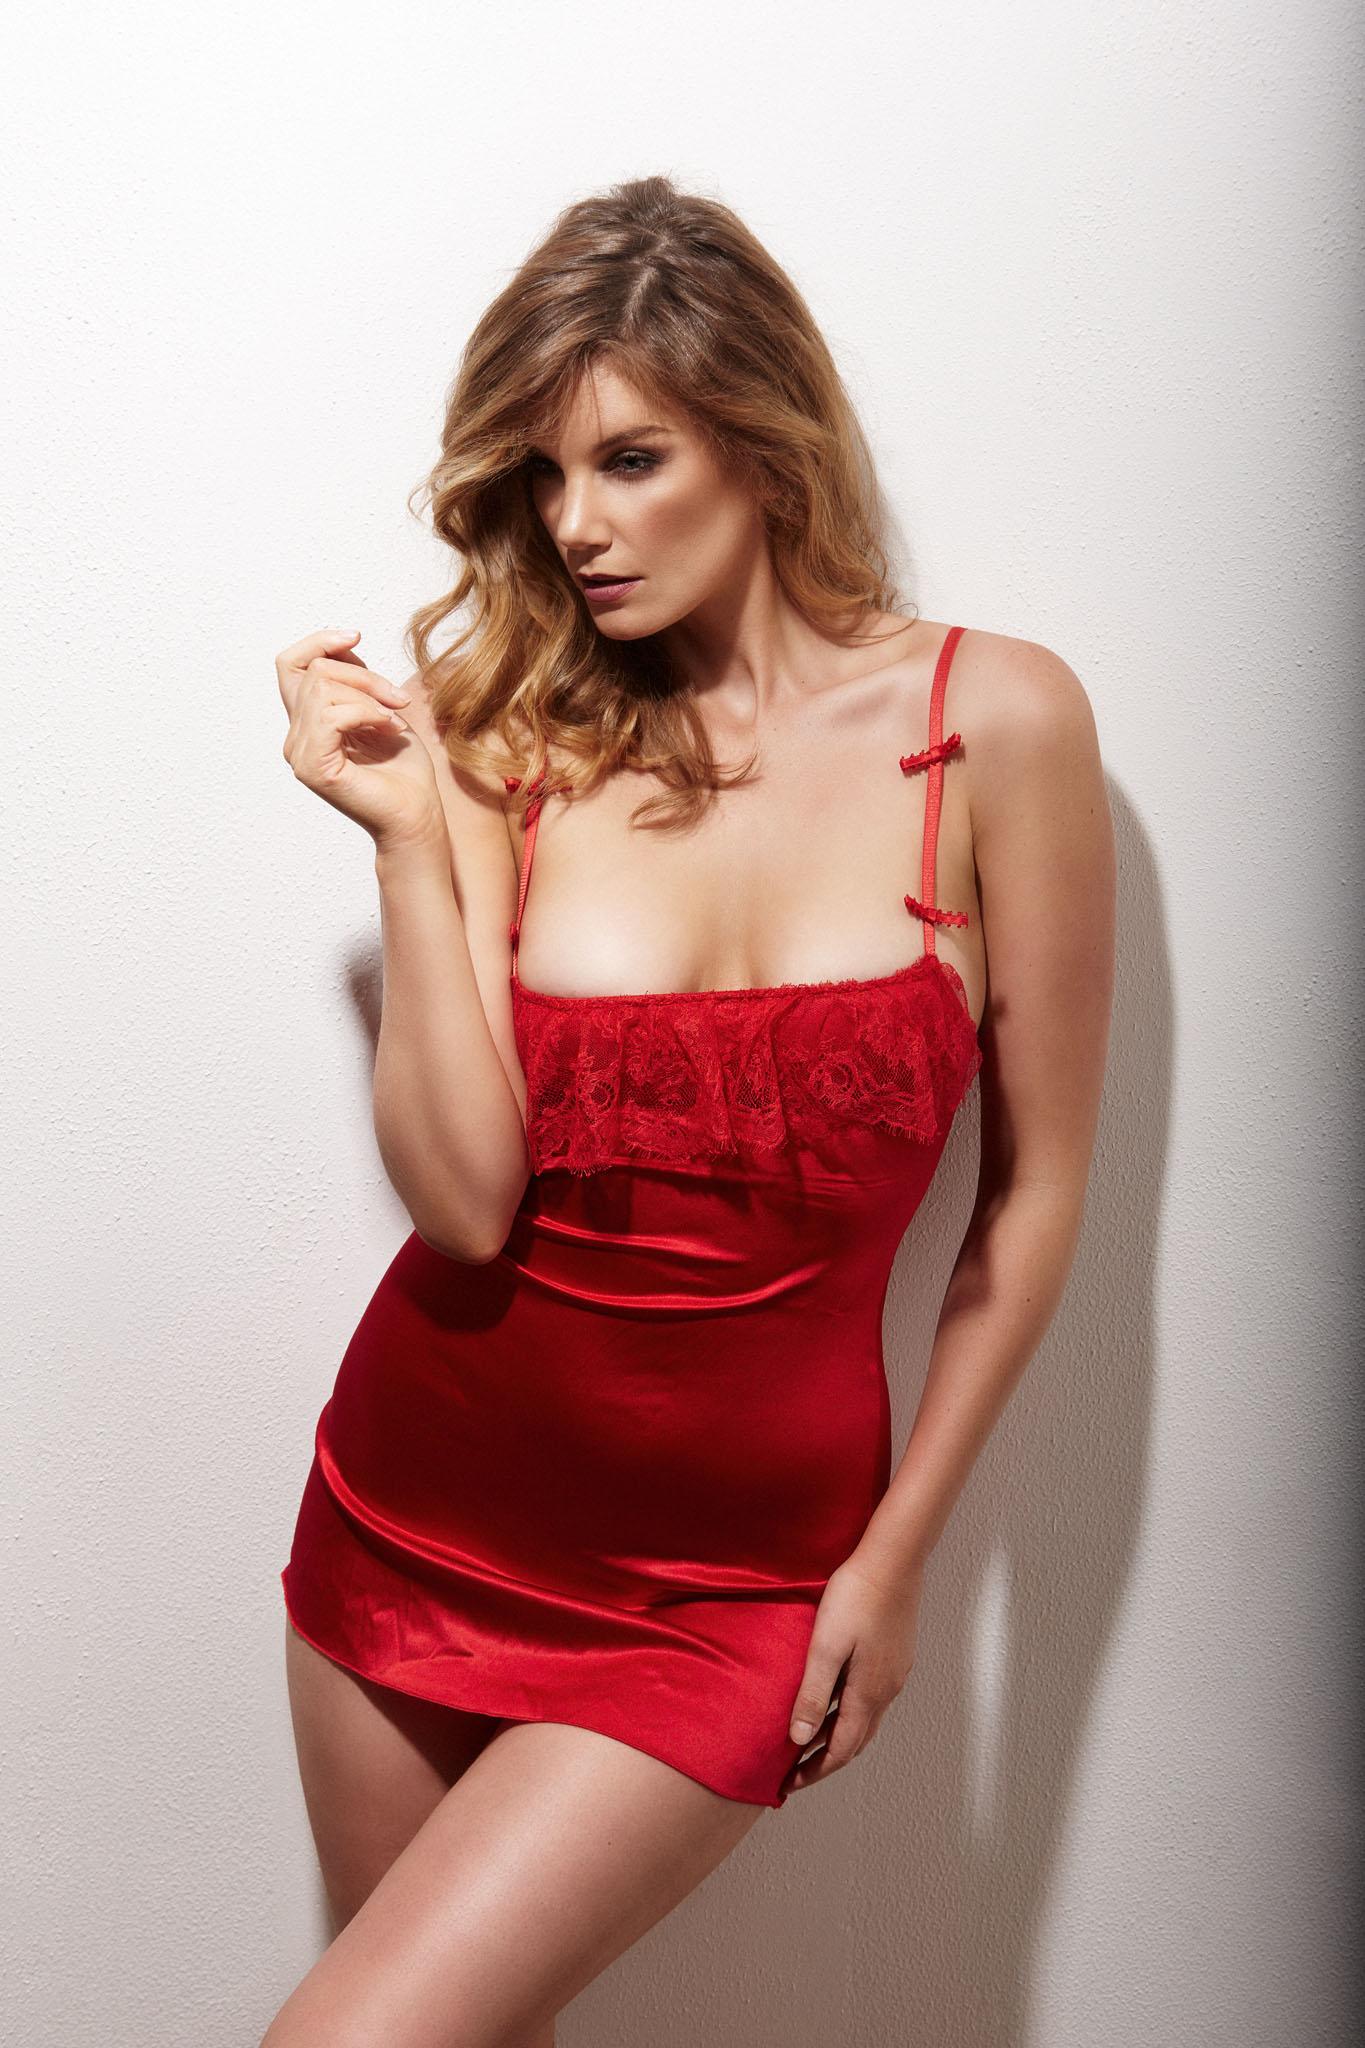 Claryssa Hummenj-Jameson8330